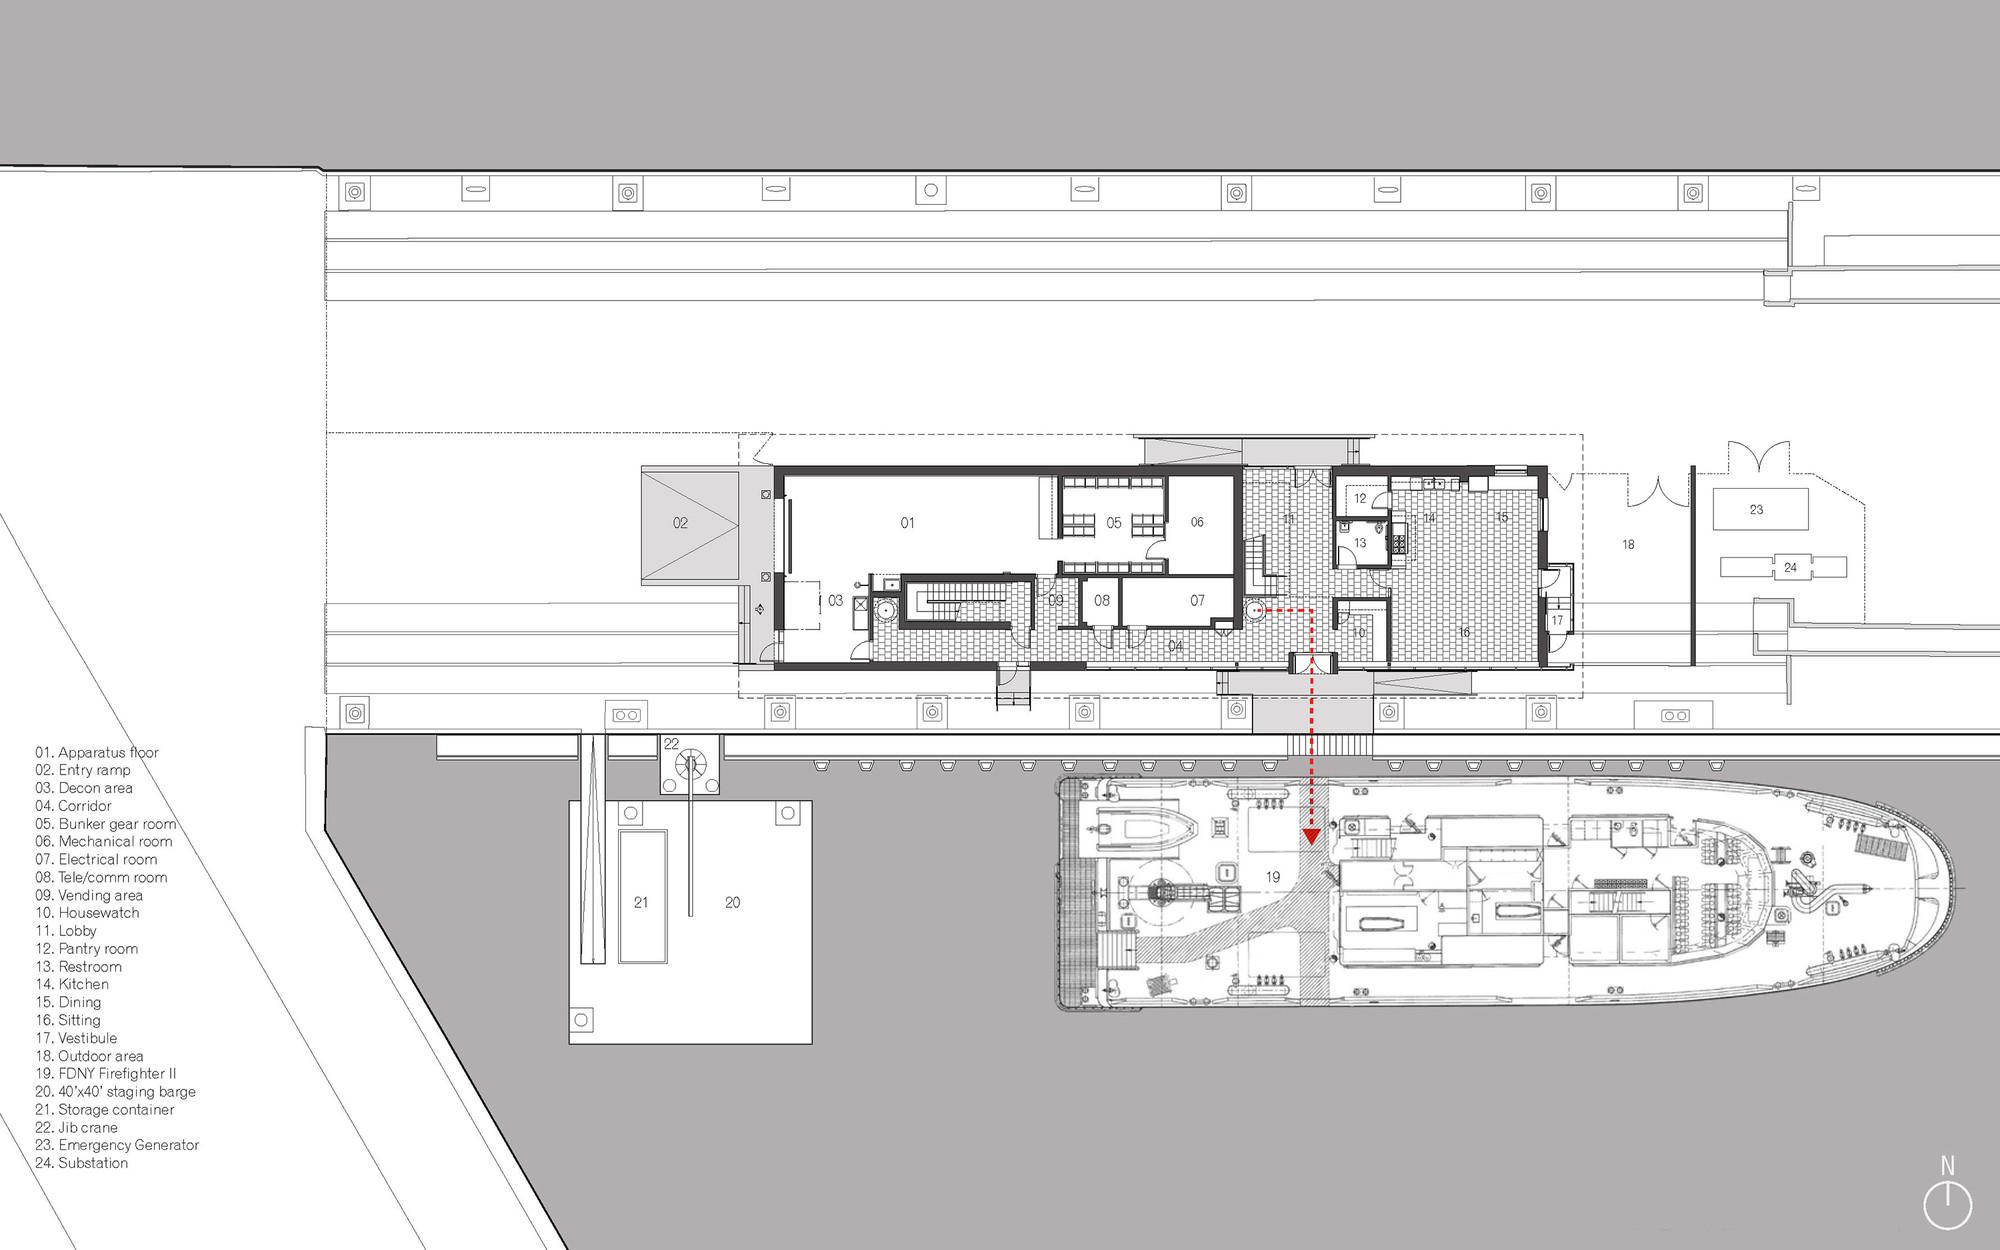 Autodesk Floor Plan Gallery Of Fdny Marine 9 Barracks Sage And Coombe 9